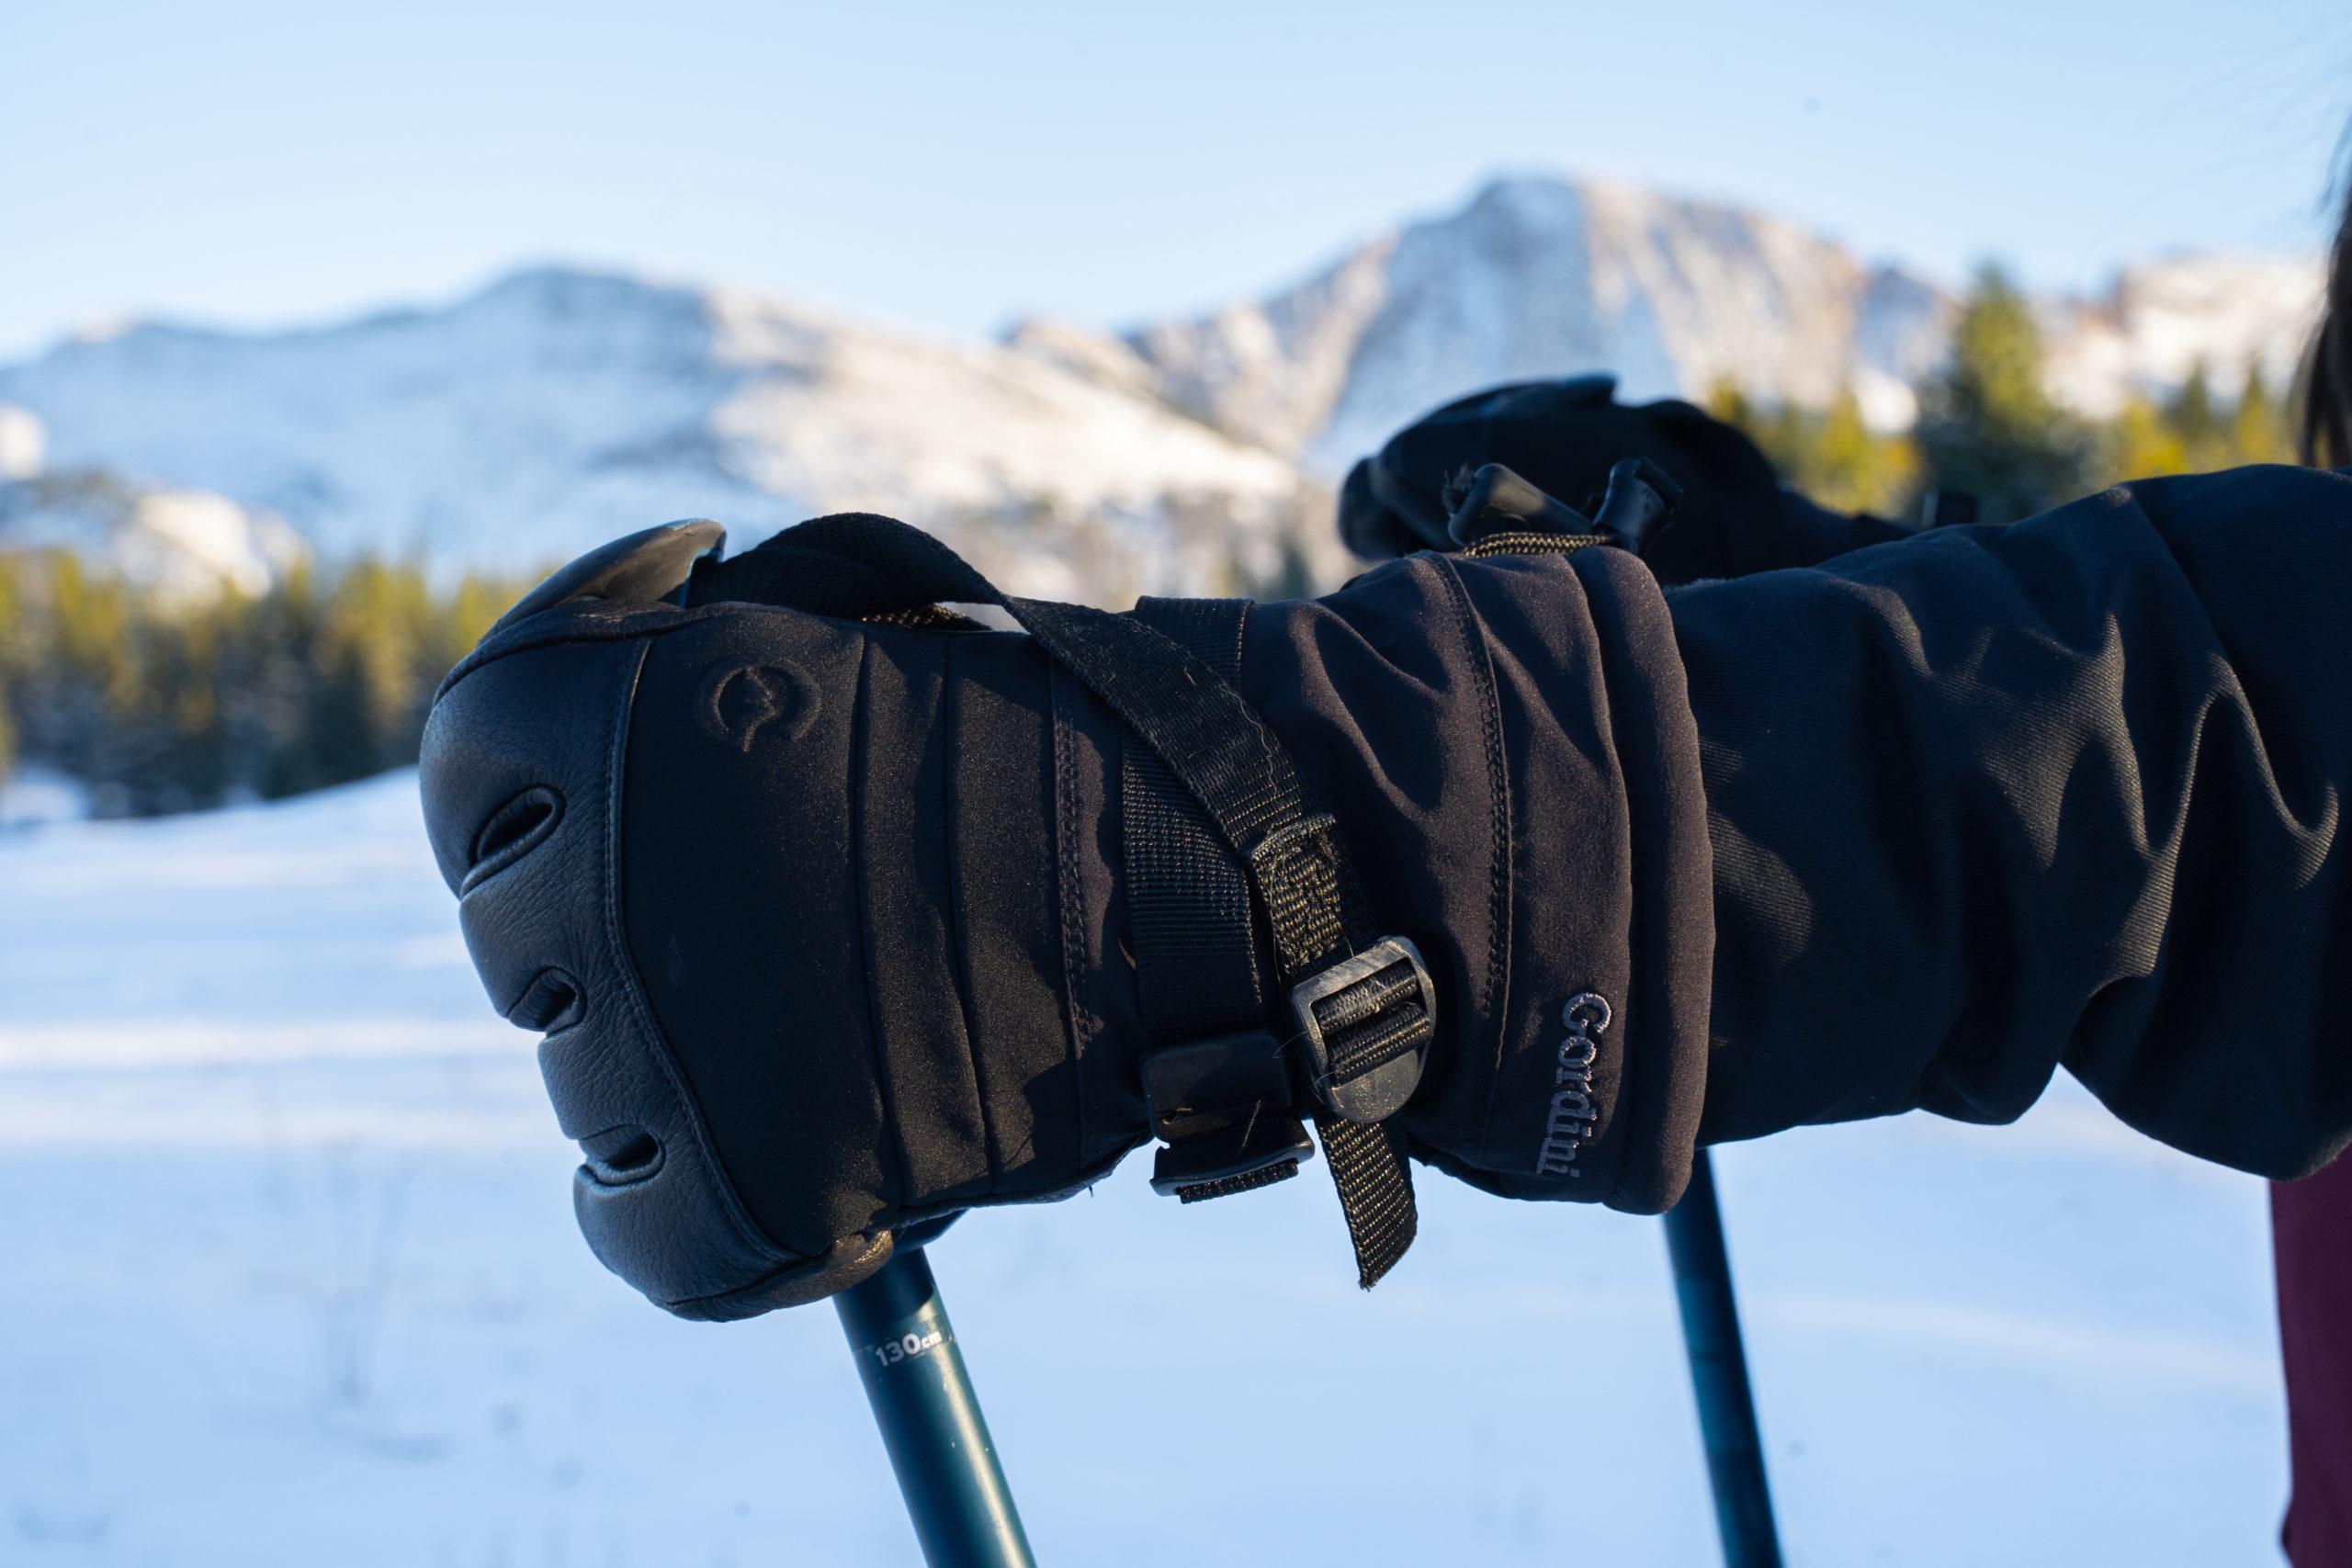 gordini polar glove landscape